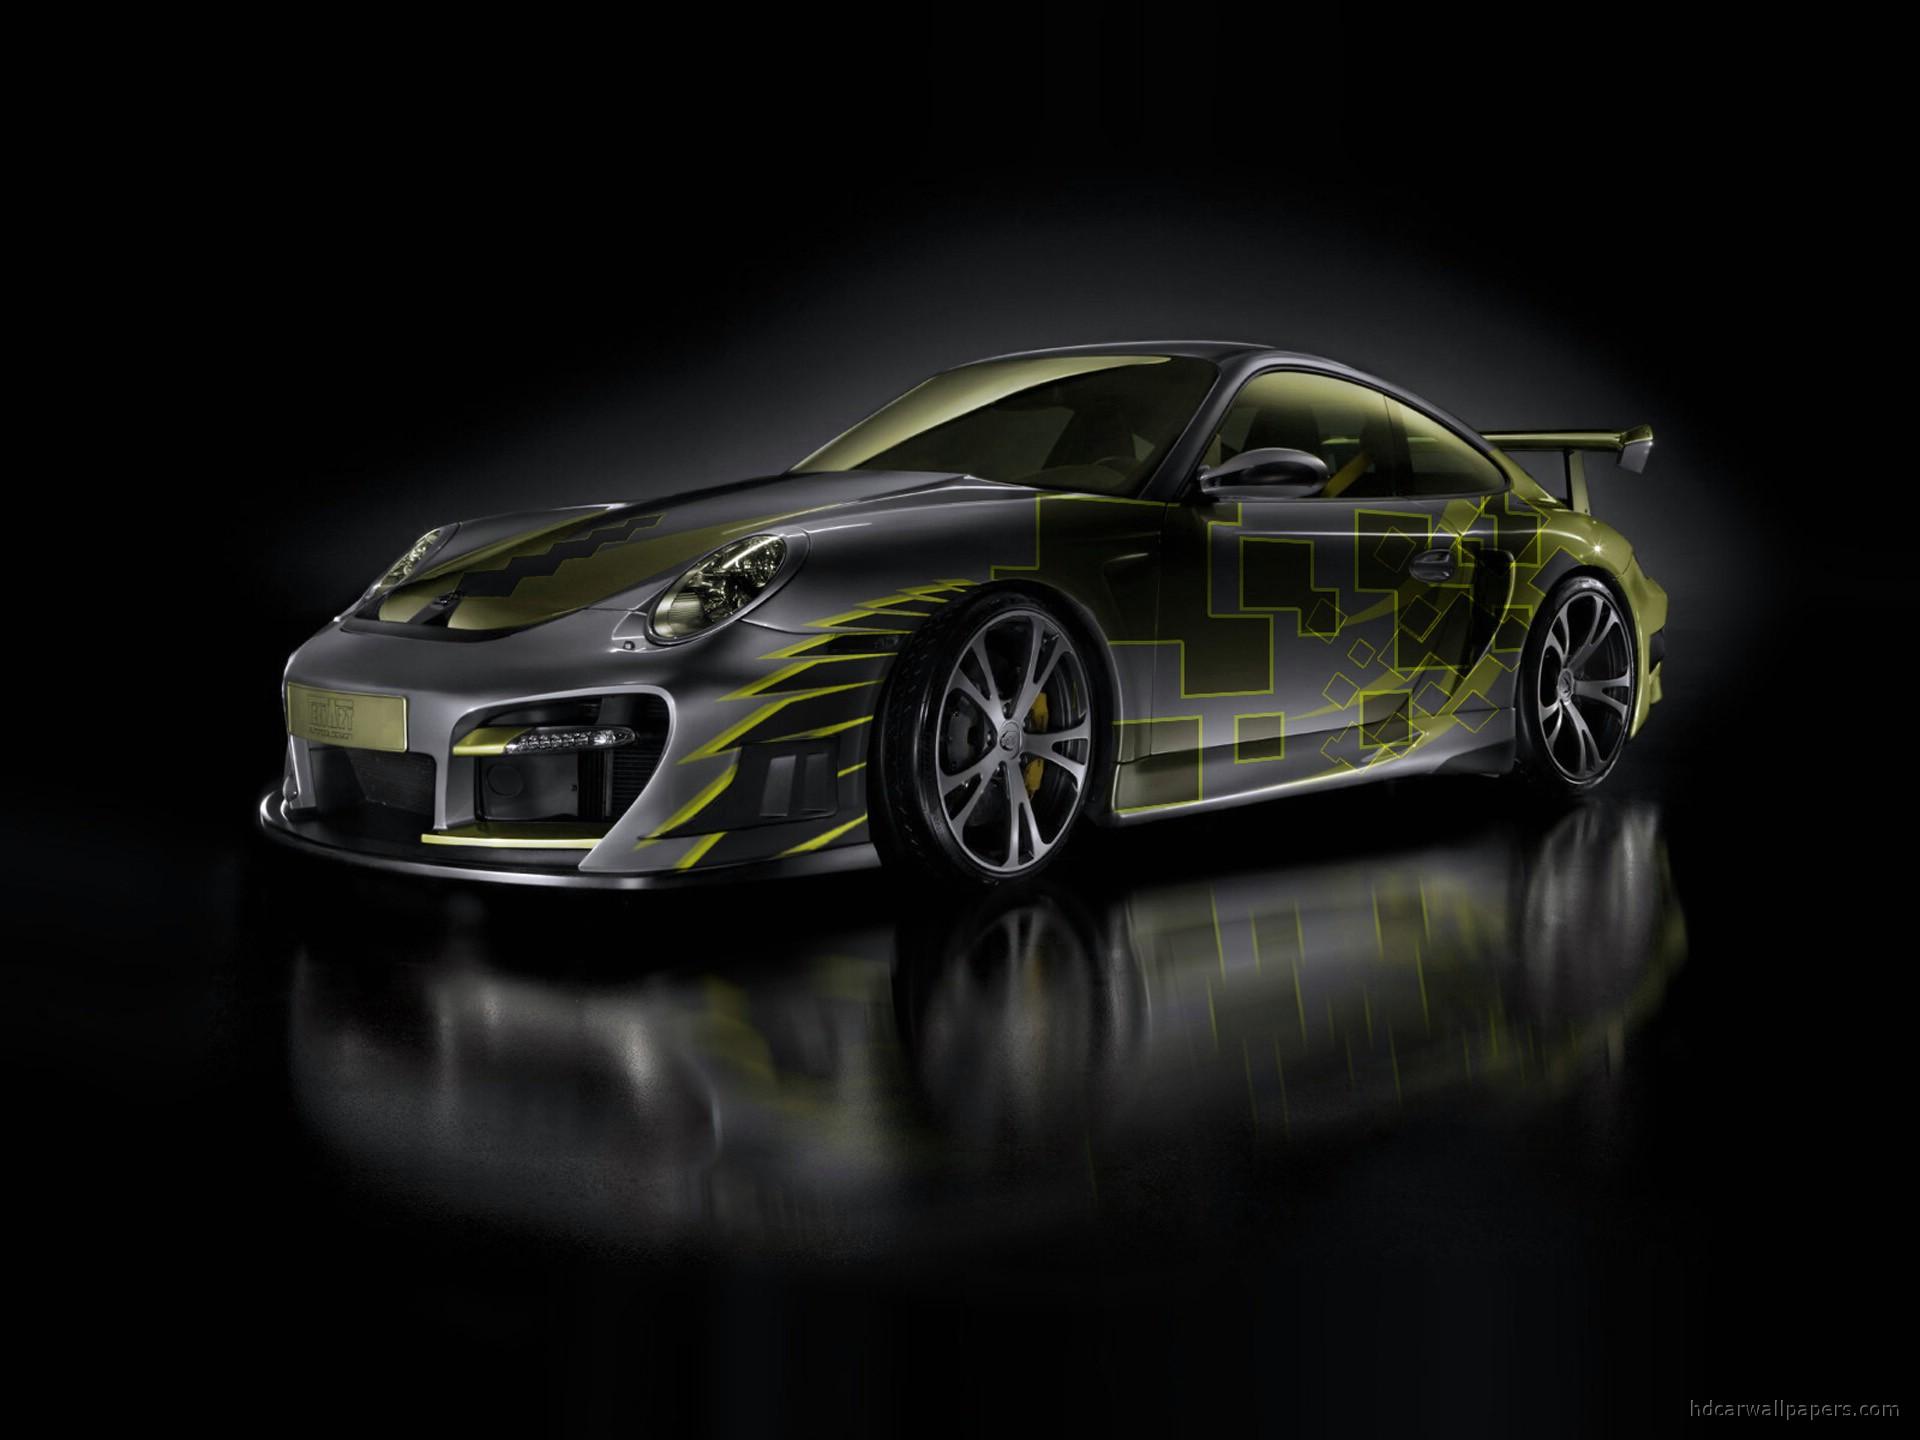 2007 <b>Porsche 911 Turbo</b> - Interior - <b>1280x960</b> - <b>Wallpaper</b>